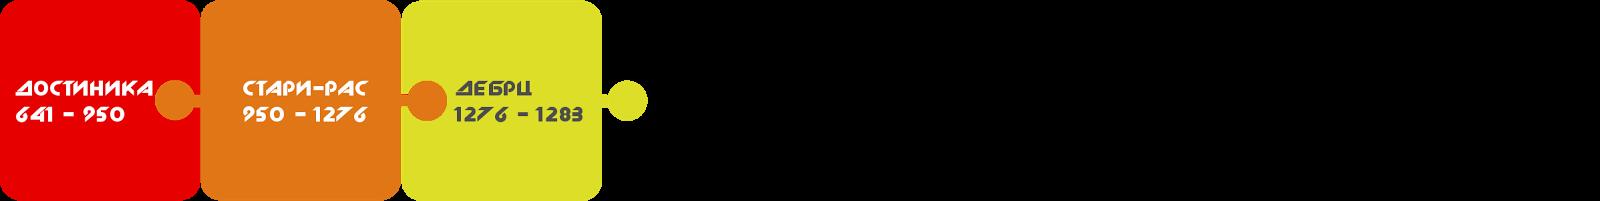 столица Дебрц